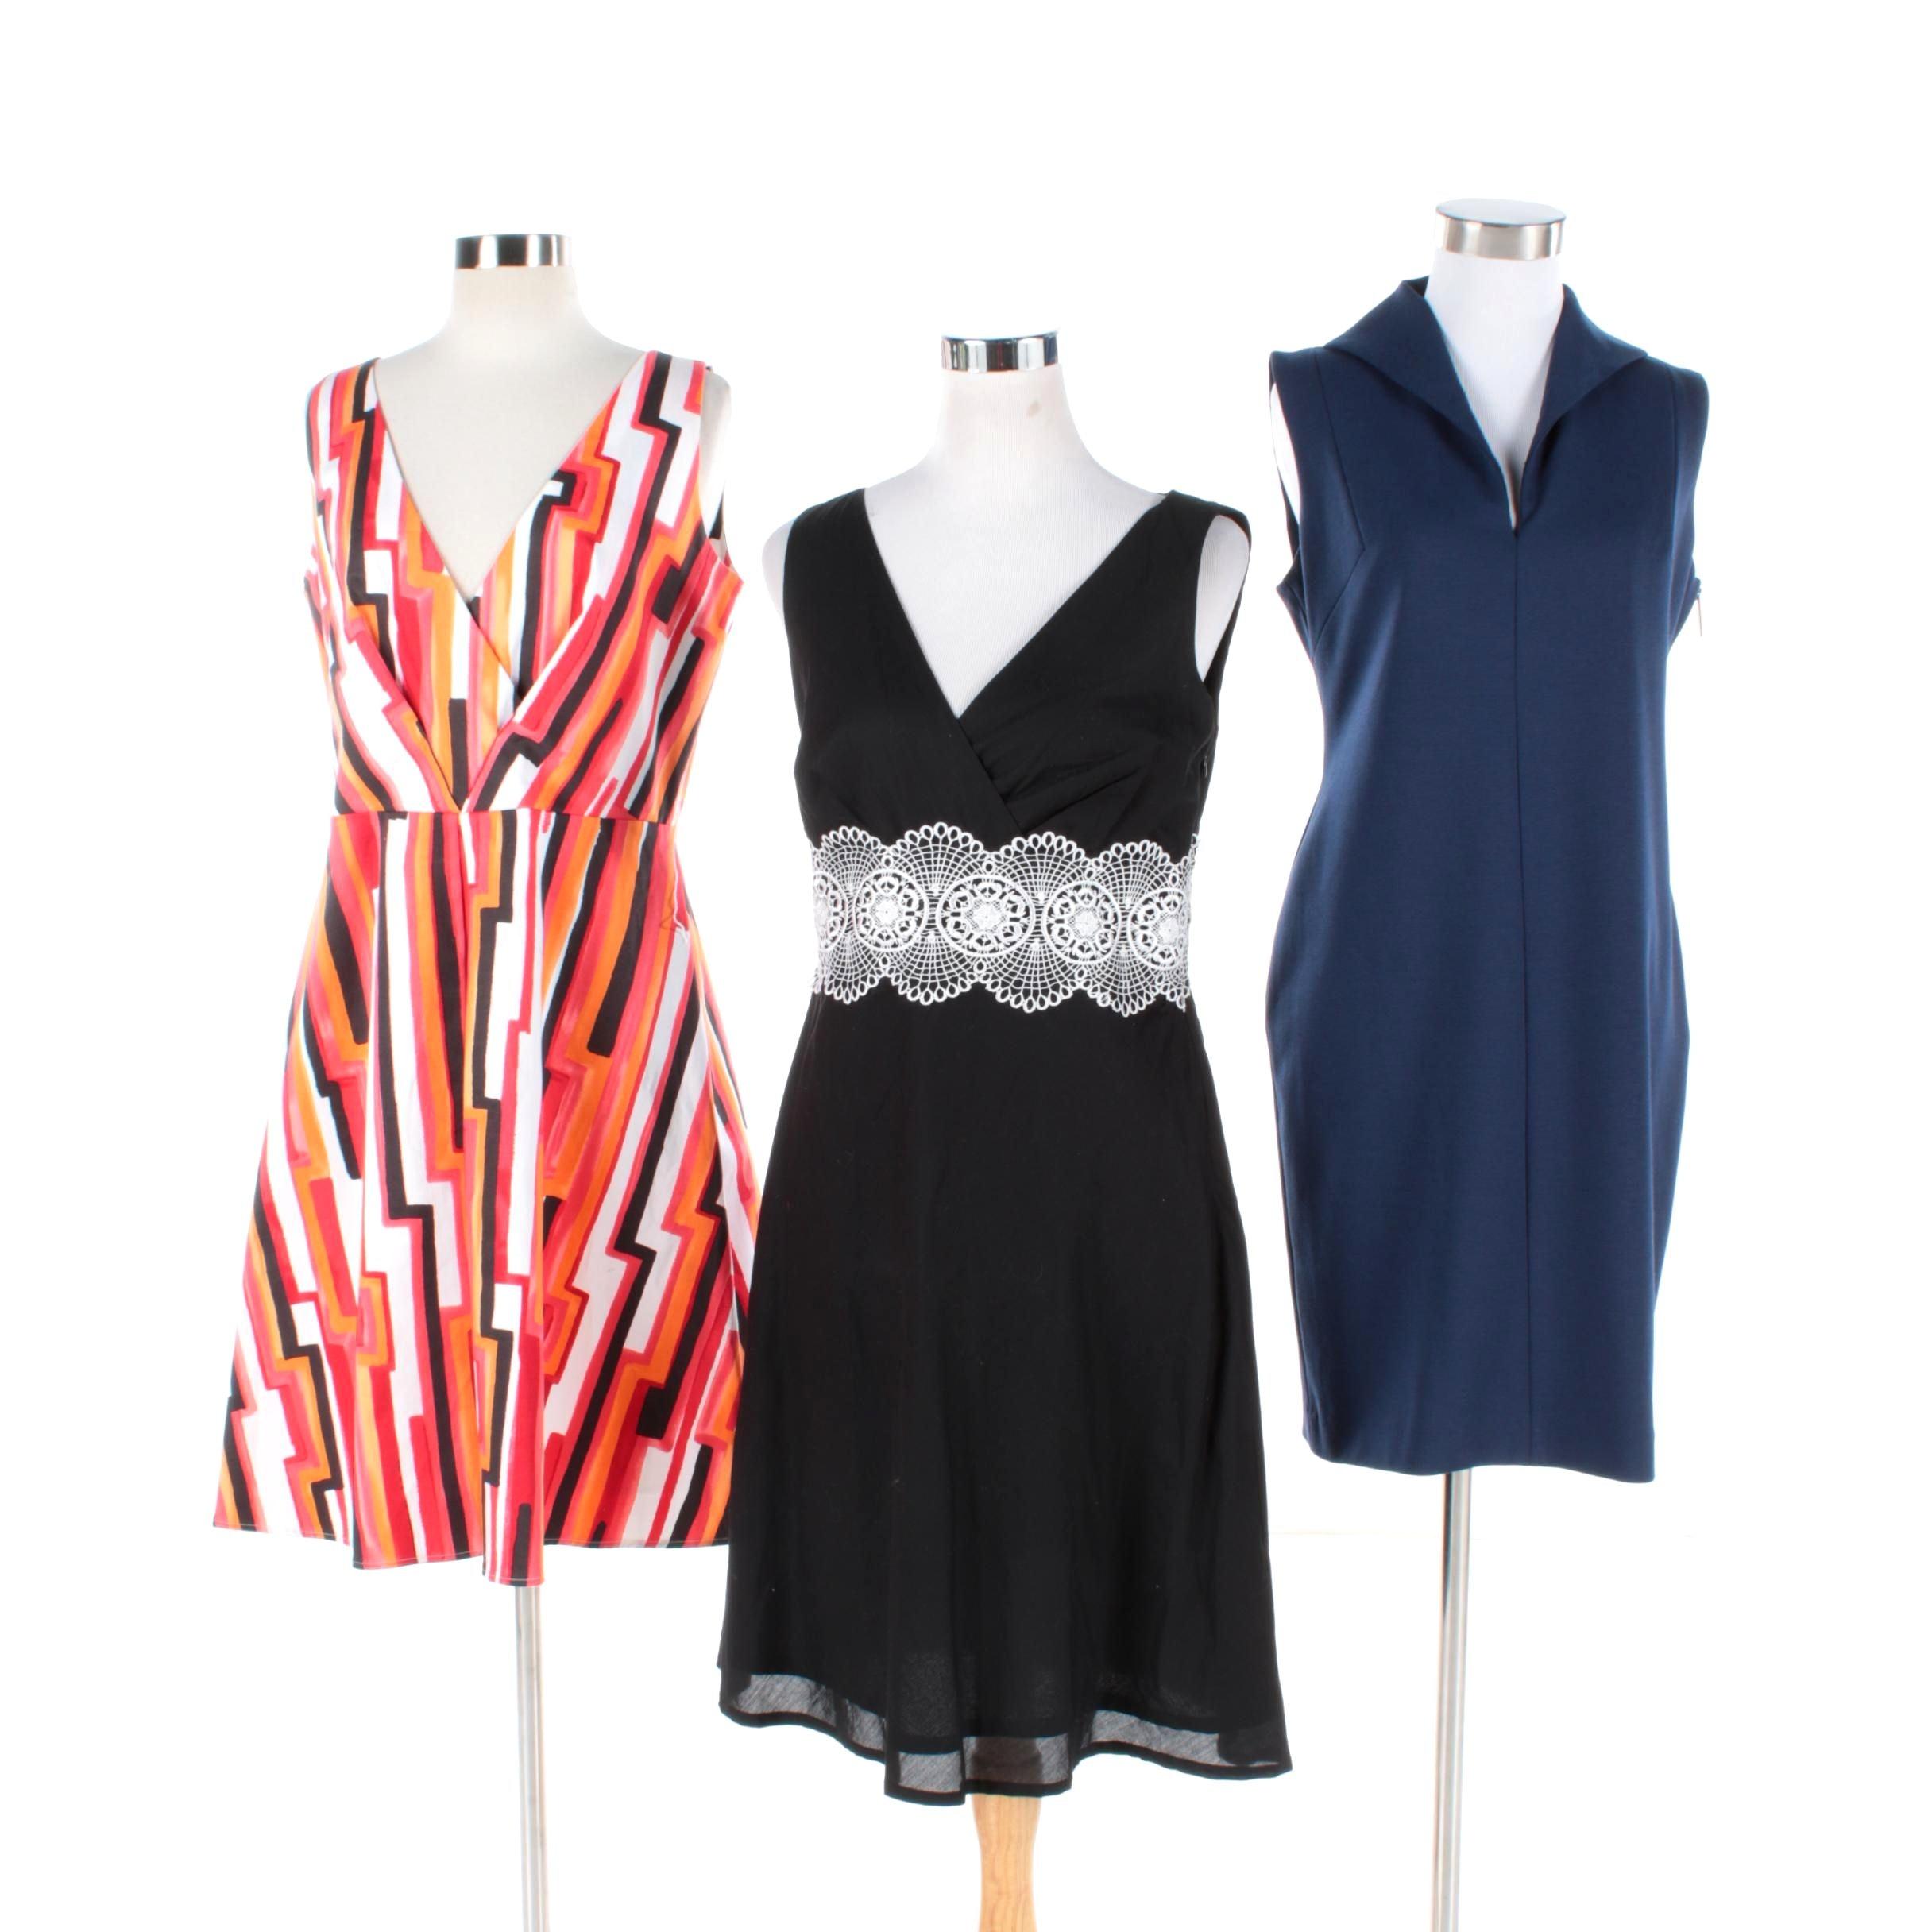 Catherine Malandrino, Calvin Klein and Ann Taylor Loft Sleeveless Dresses